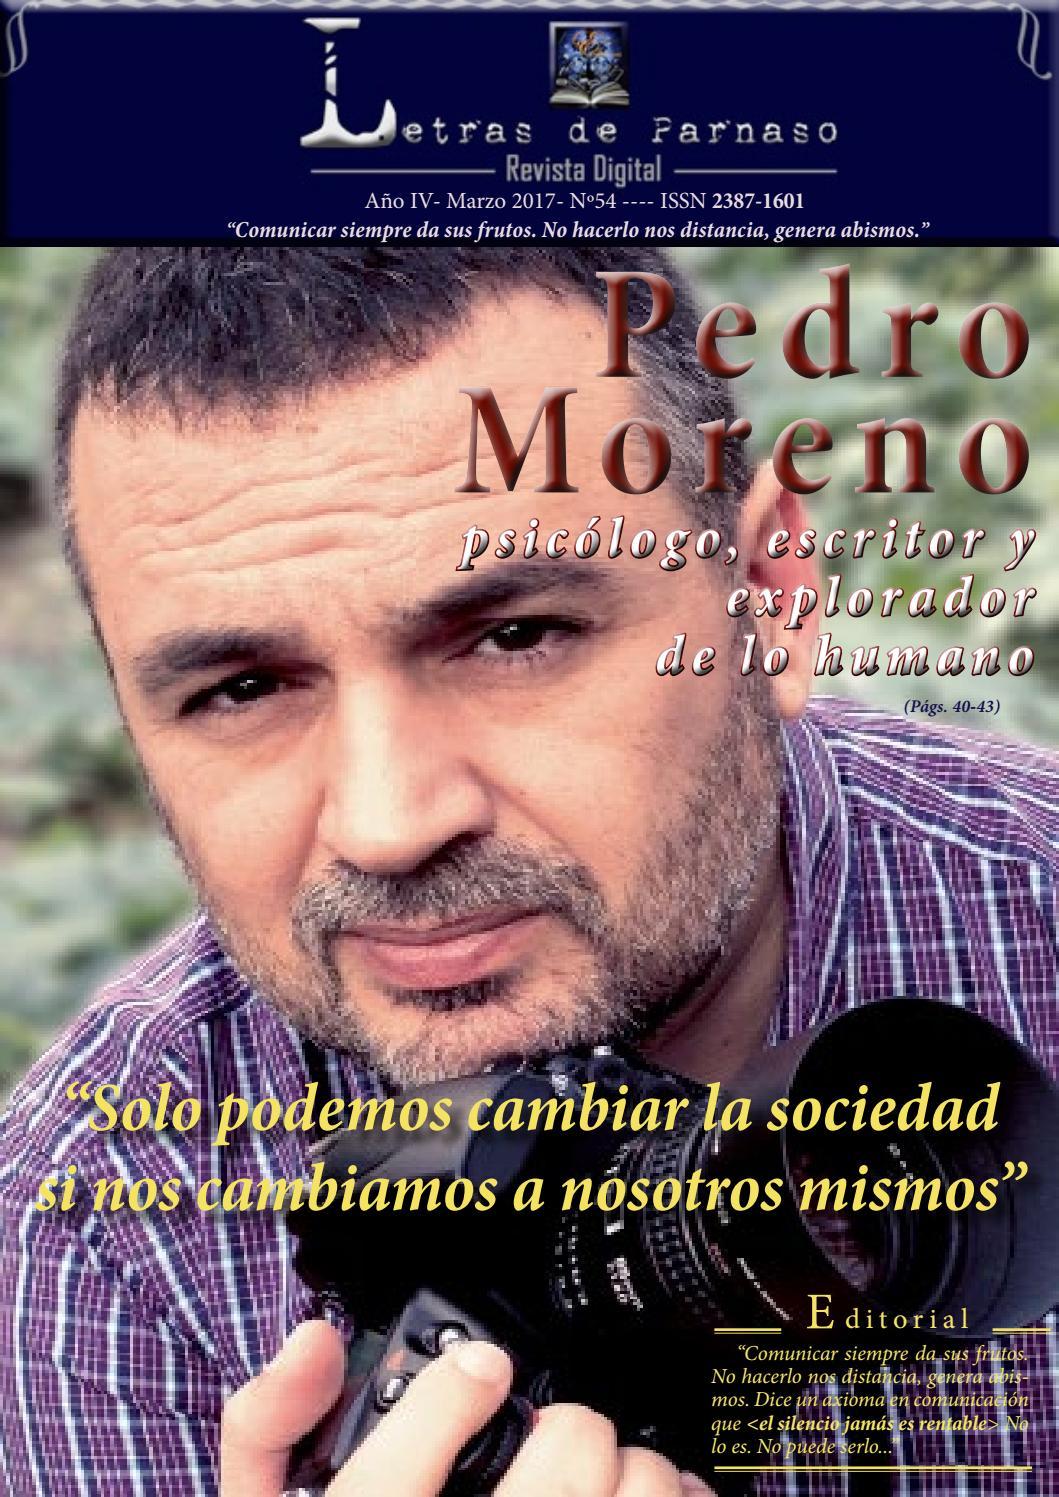 Edicion54 by Juan Antonio Pellicer - issuu ec6c0993a0b